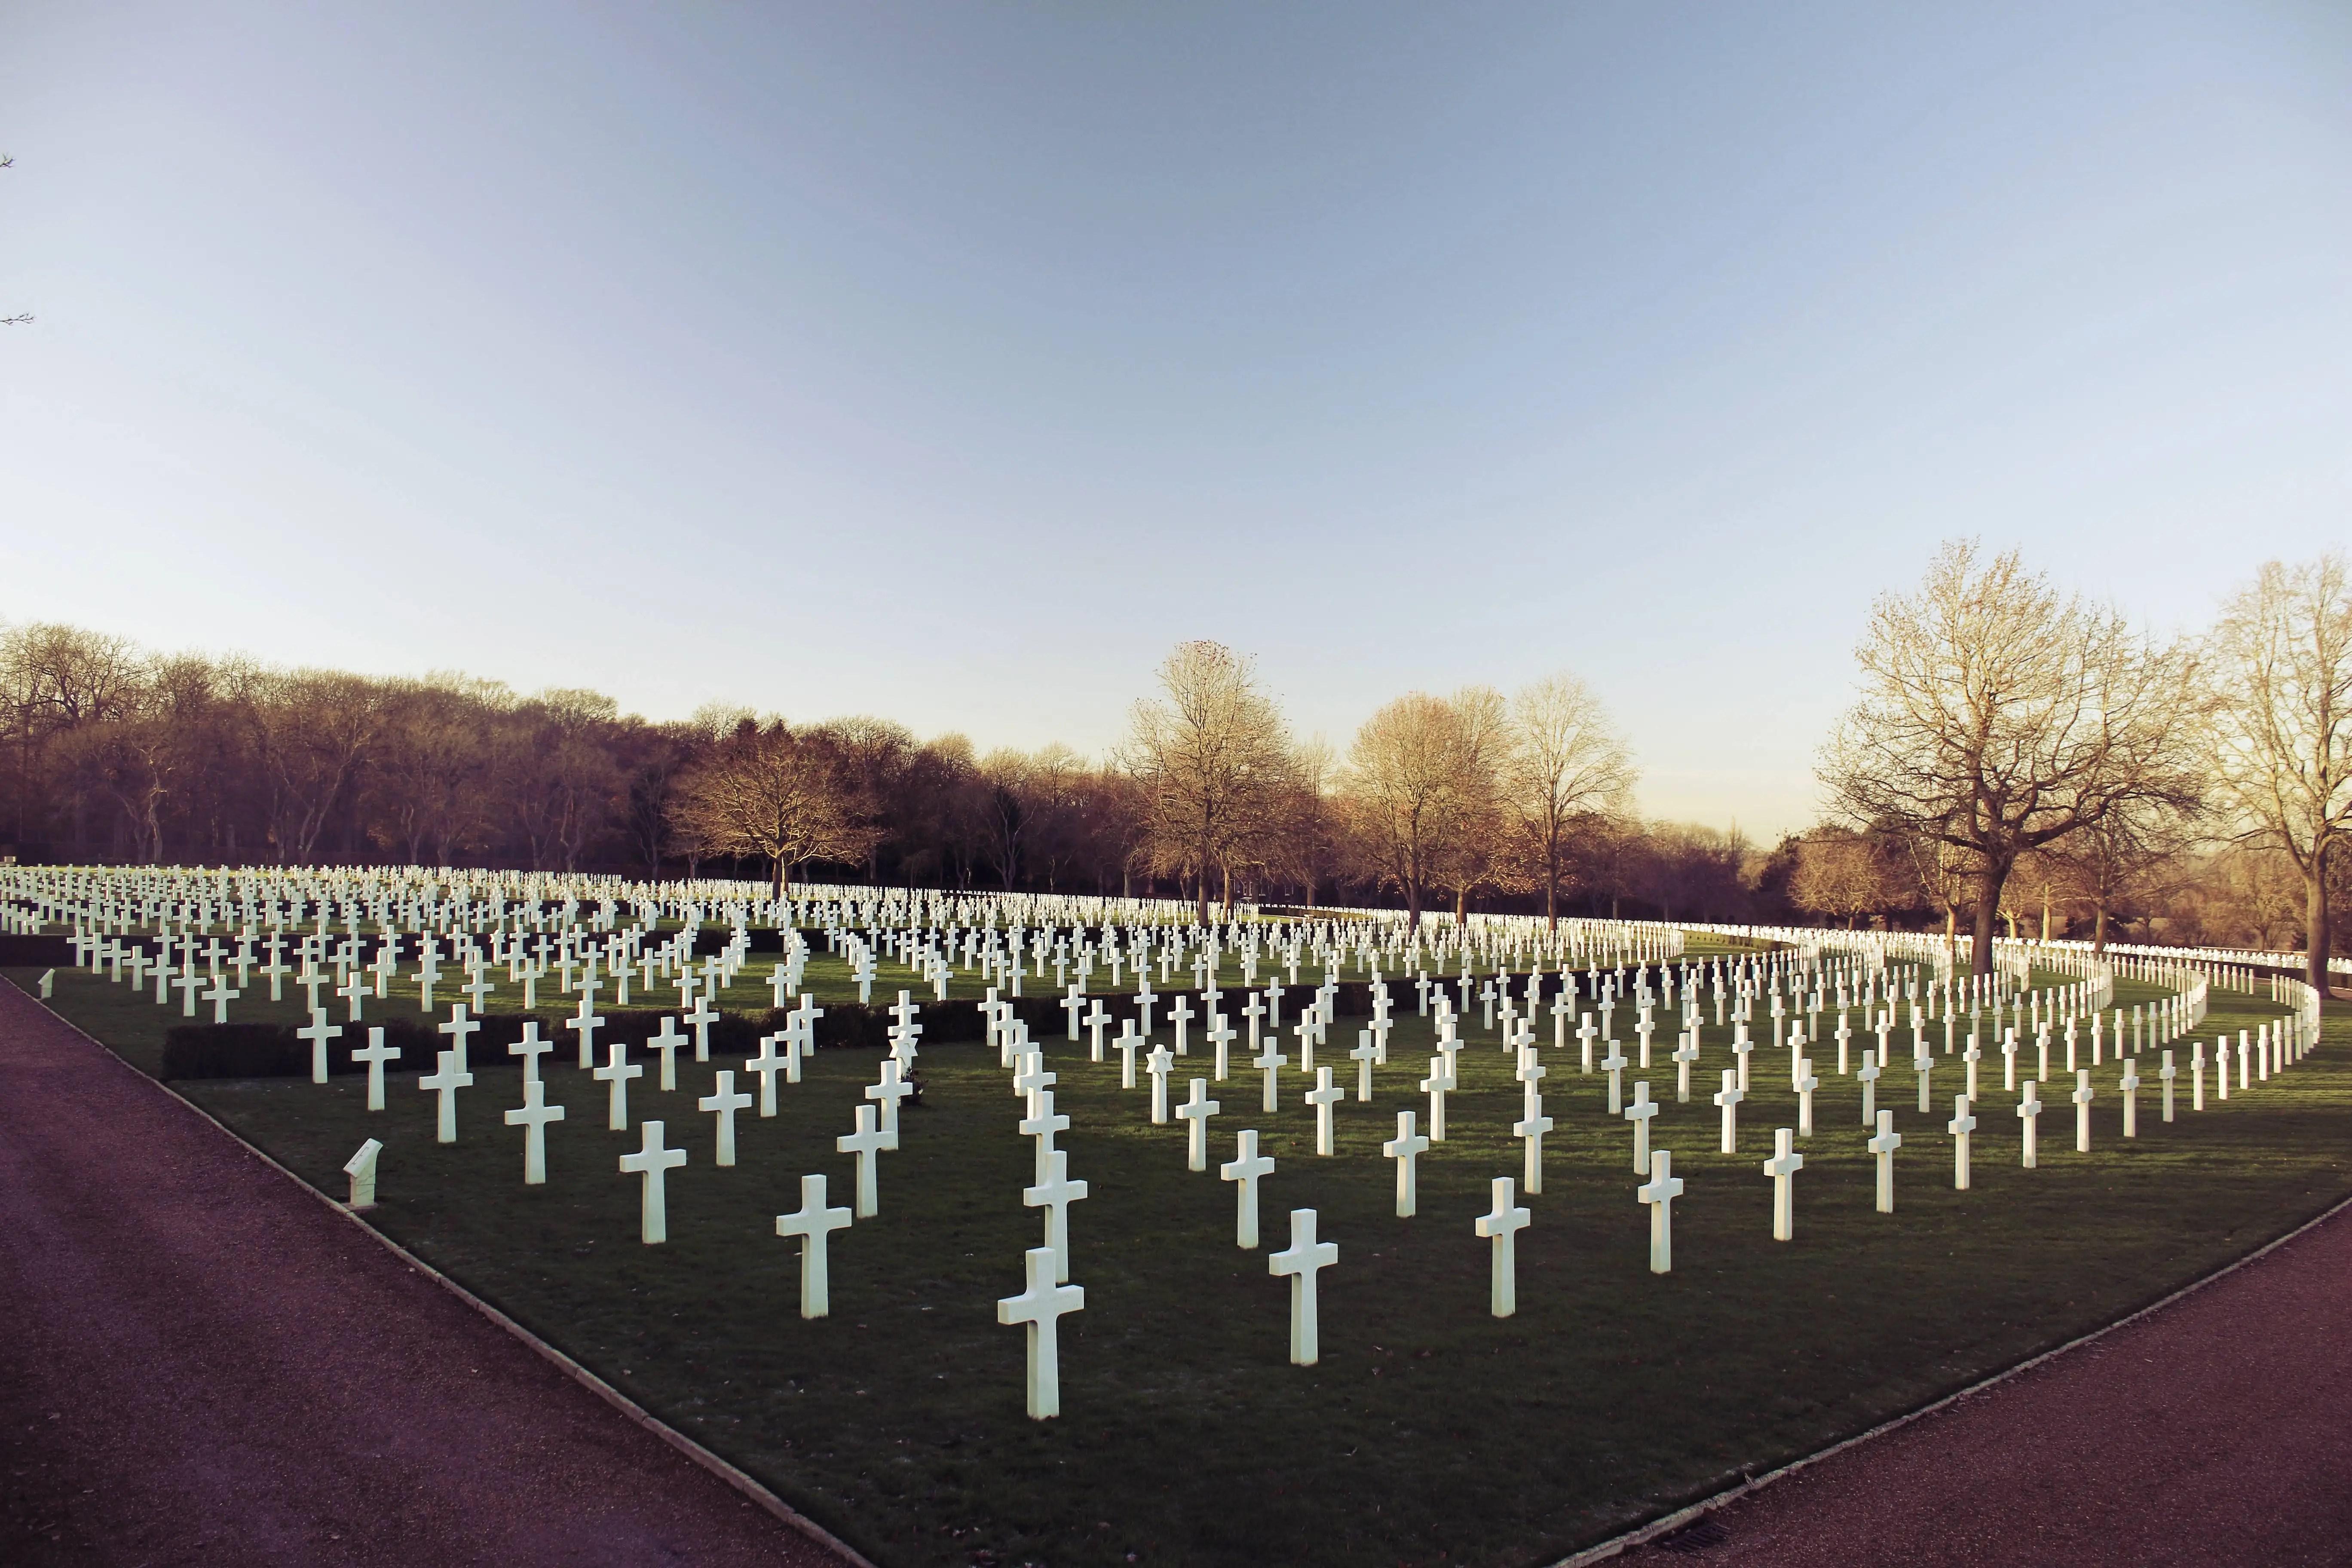 The cemetery app